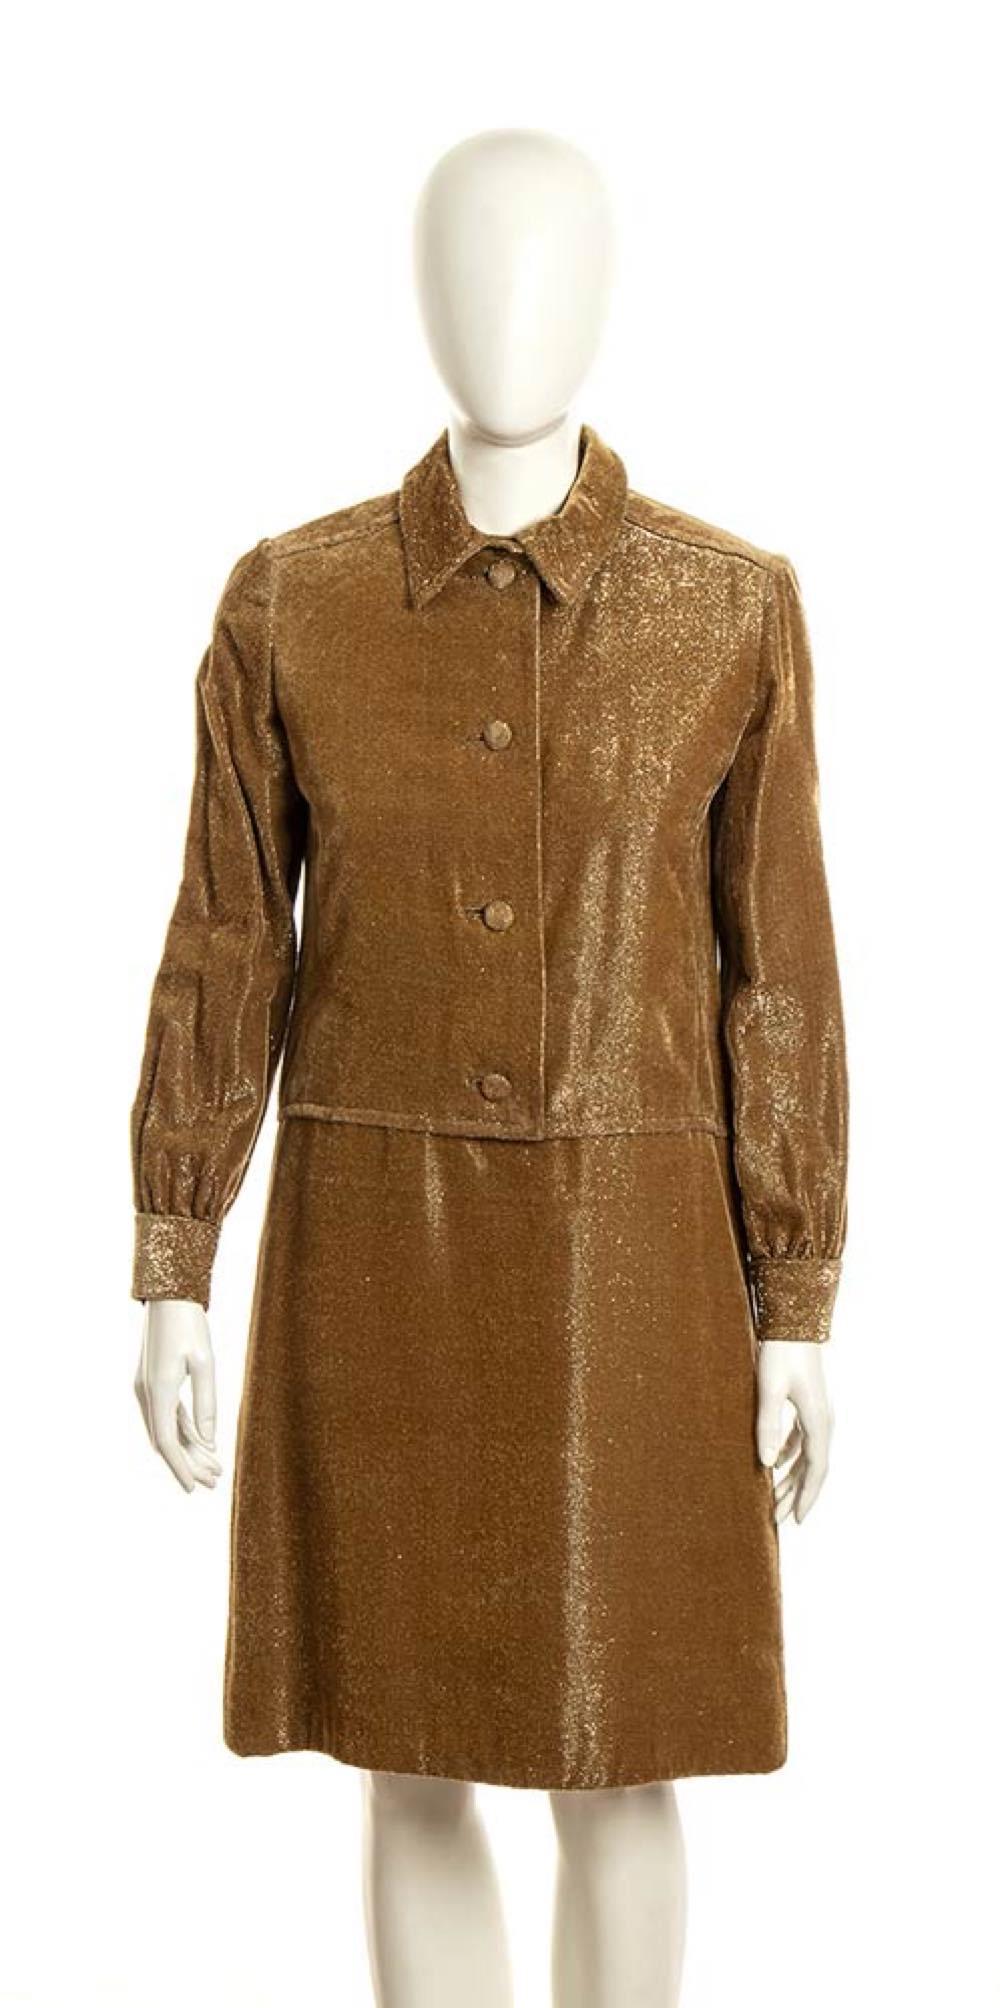 LANCETTI - LAME' DRESS - Mid 60s